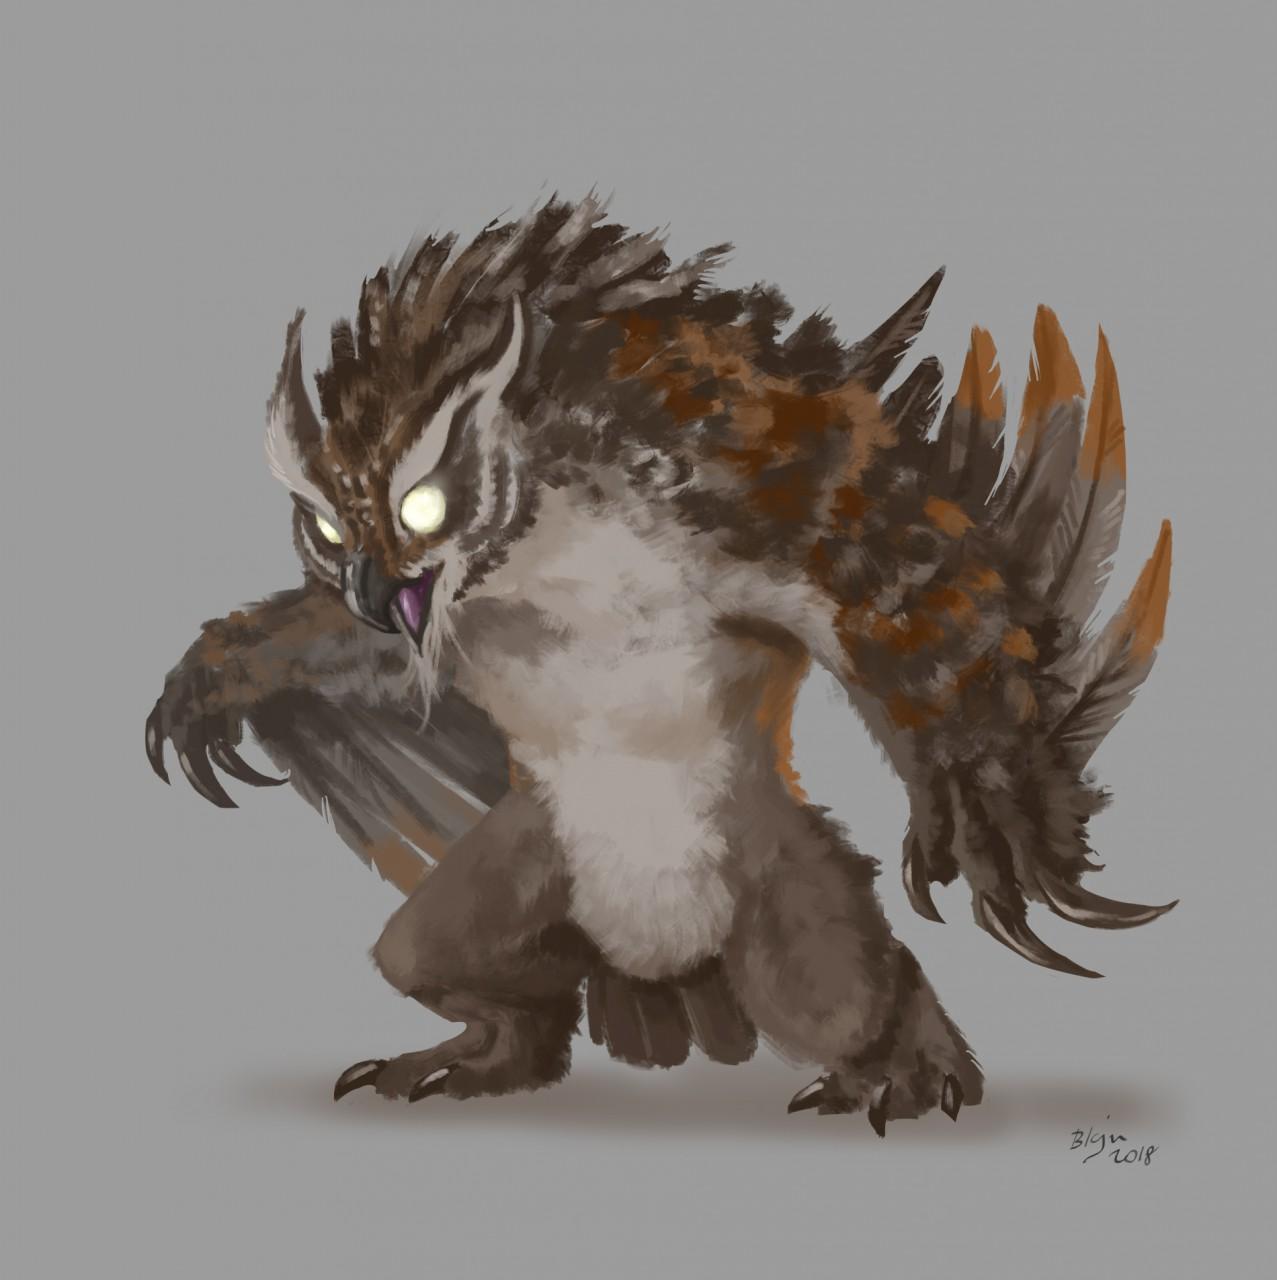 Shrike Dauntless fanart